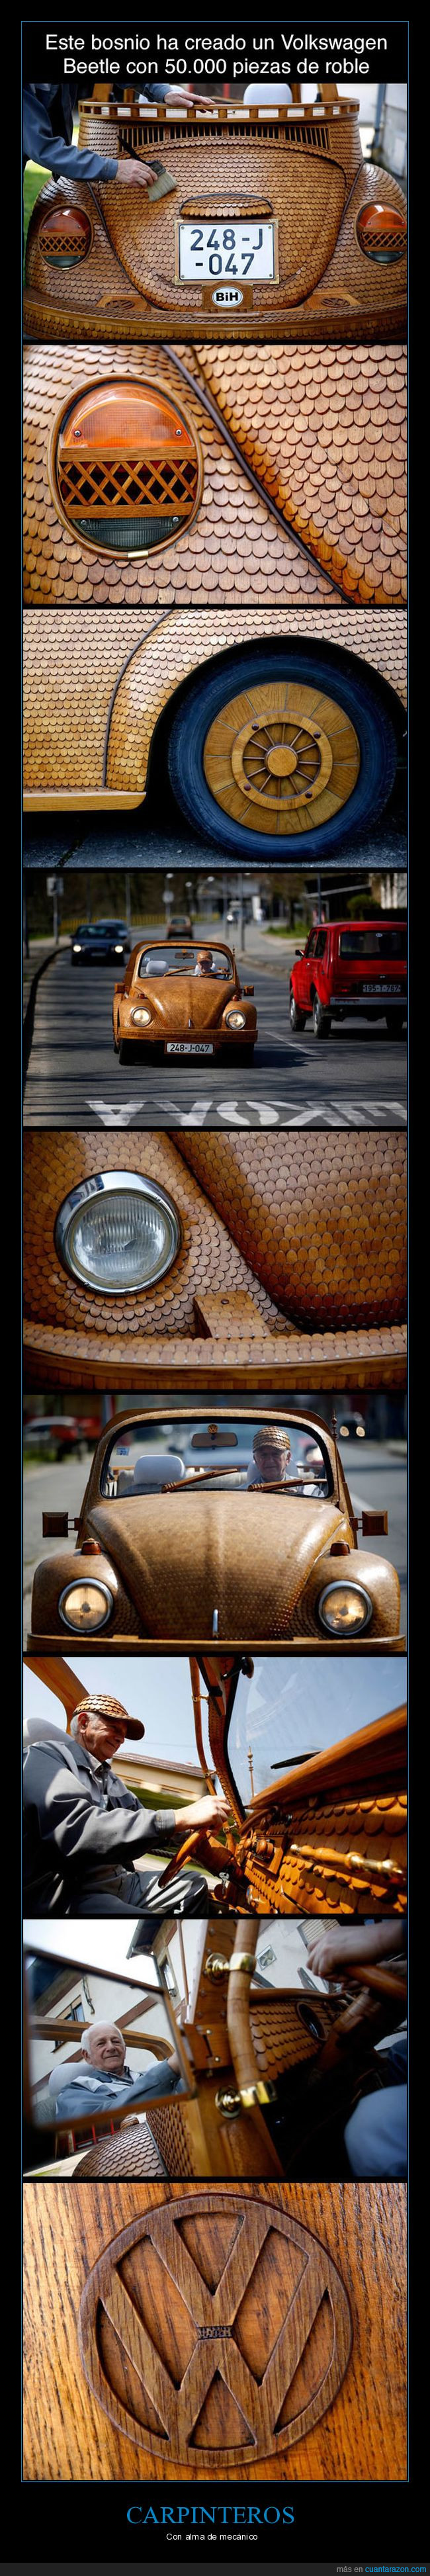 coche,madera,oak,piezas,roble,volkswagen beetle